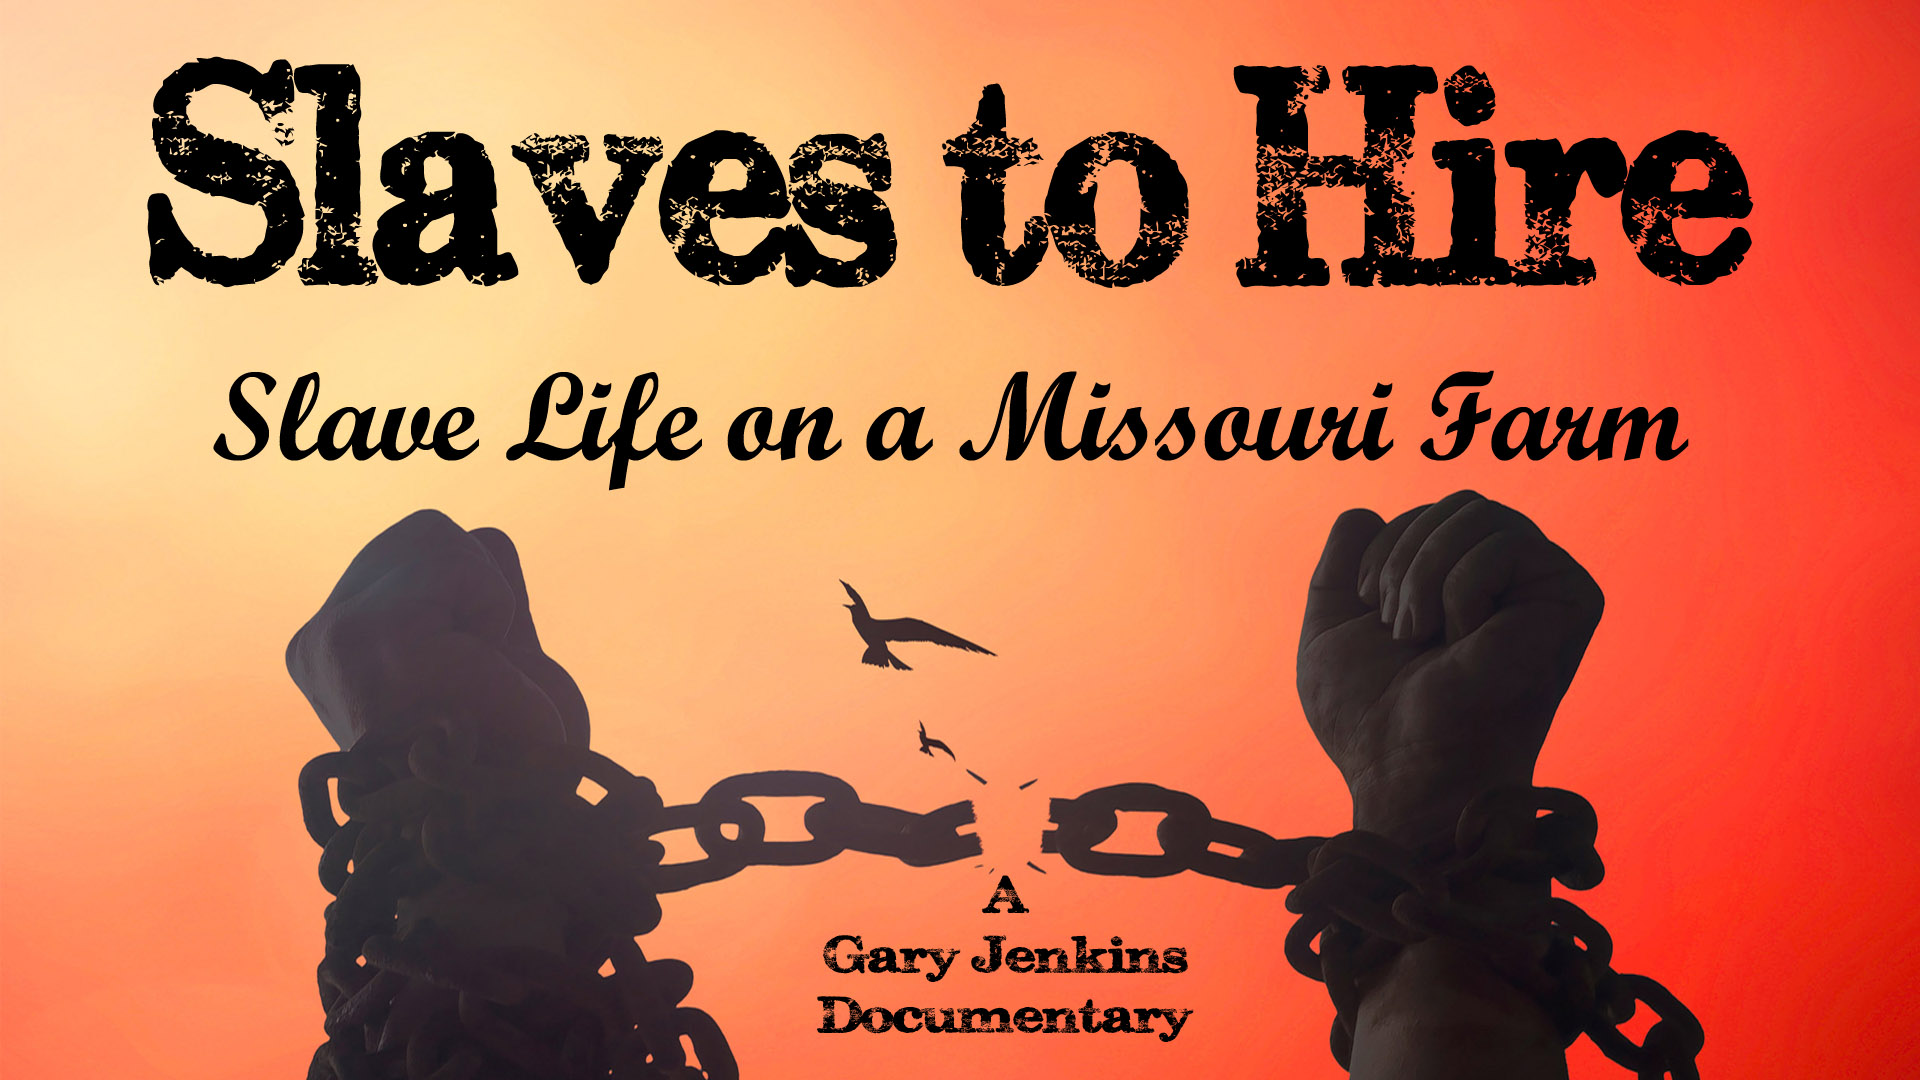 Slaves to Hire: Slave Life on a Missouri Farm